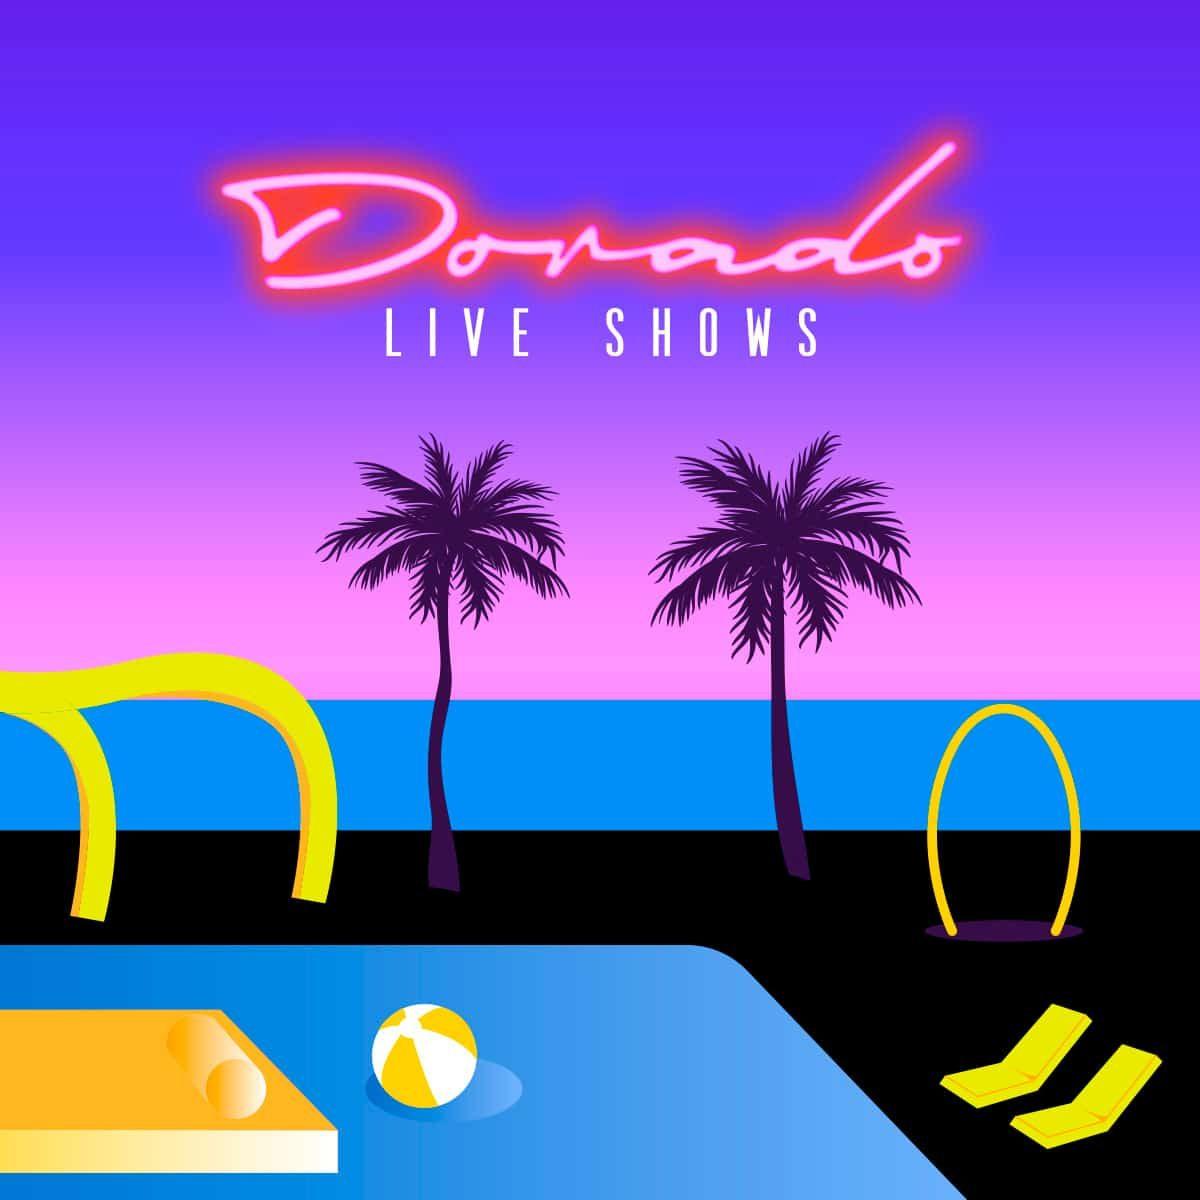 daurat-live-shows-sants-Eivissa-welcometoibiza